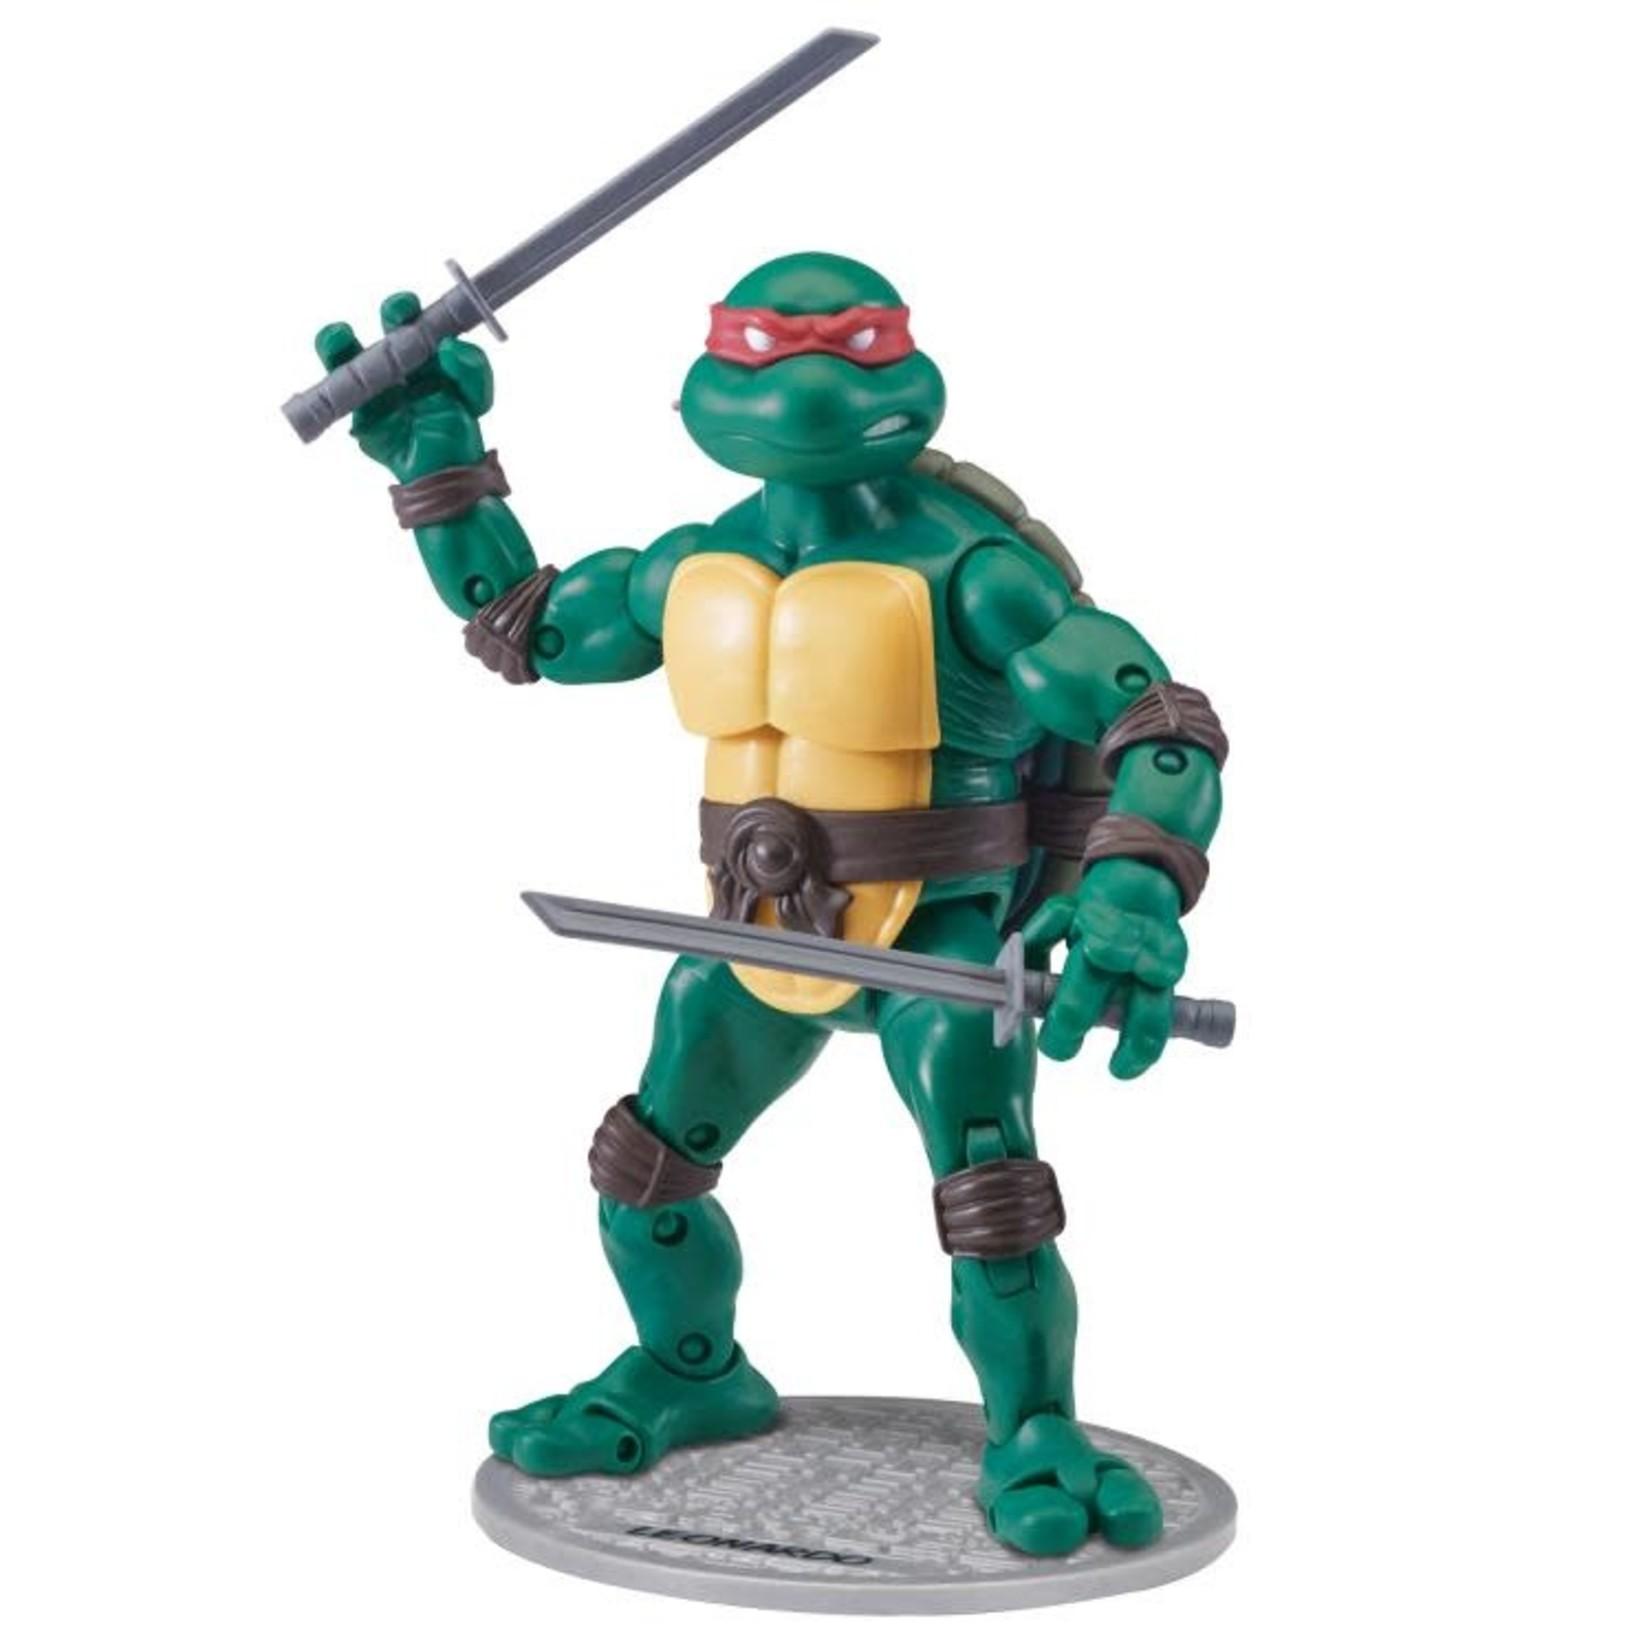 playmates TMNT Ninja Elite Series PX Previews Exclusive - Leonardo